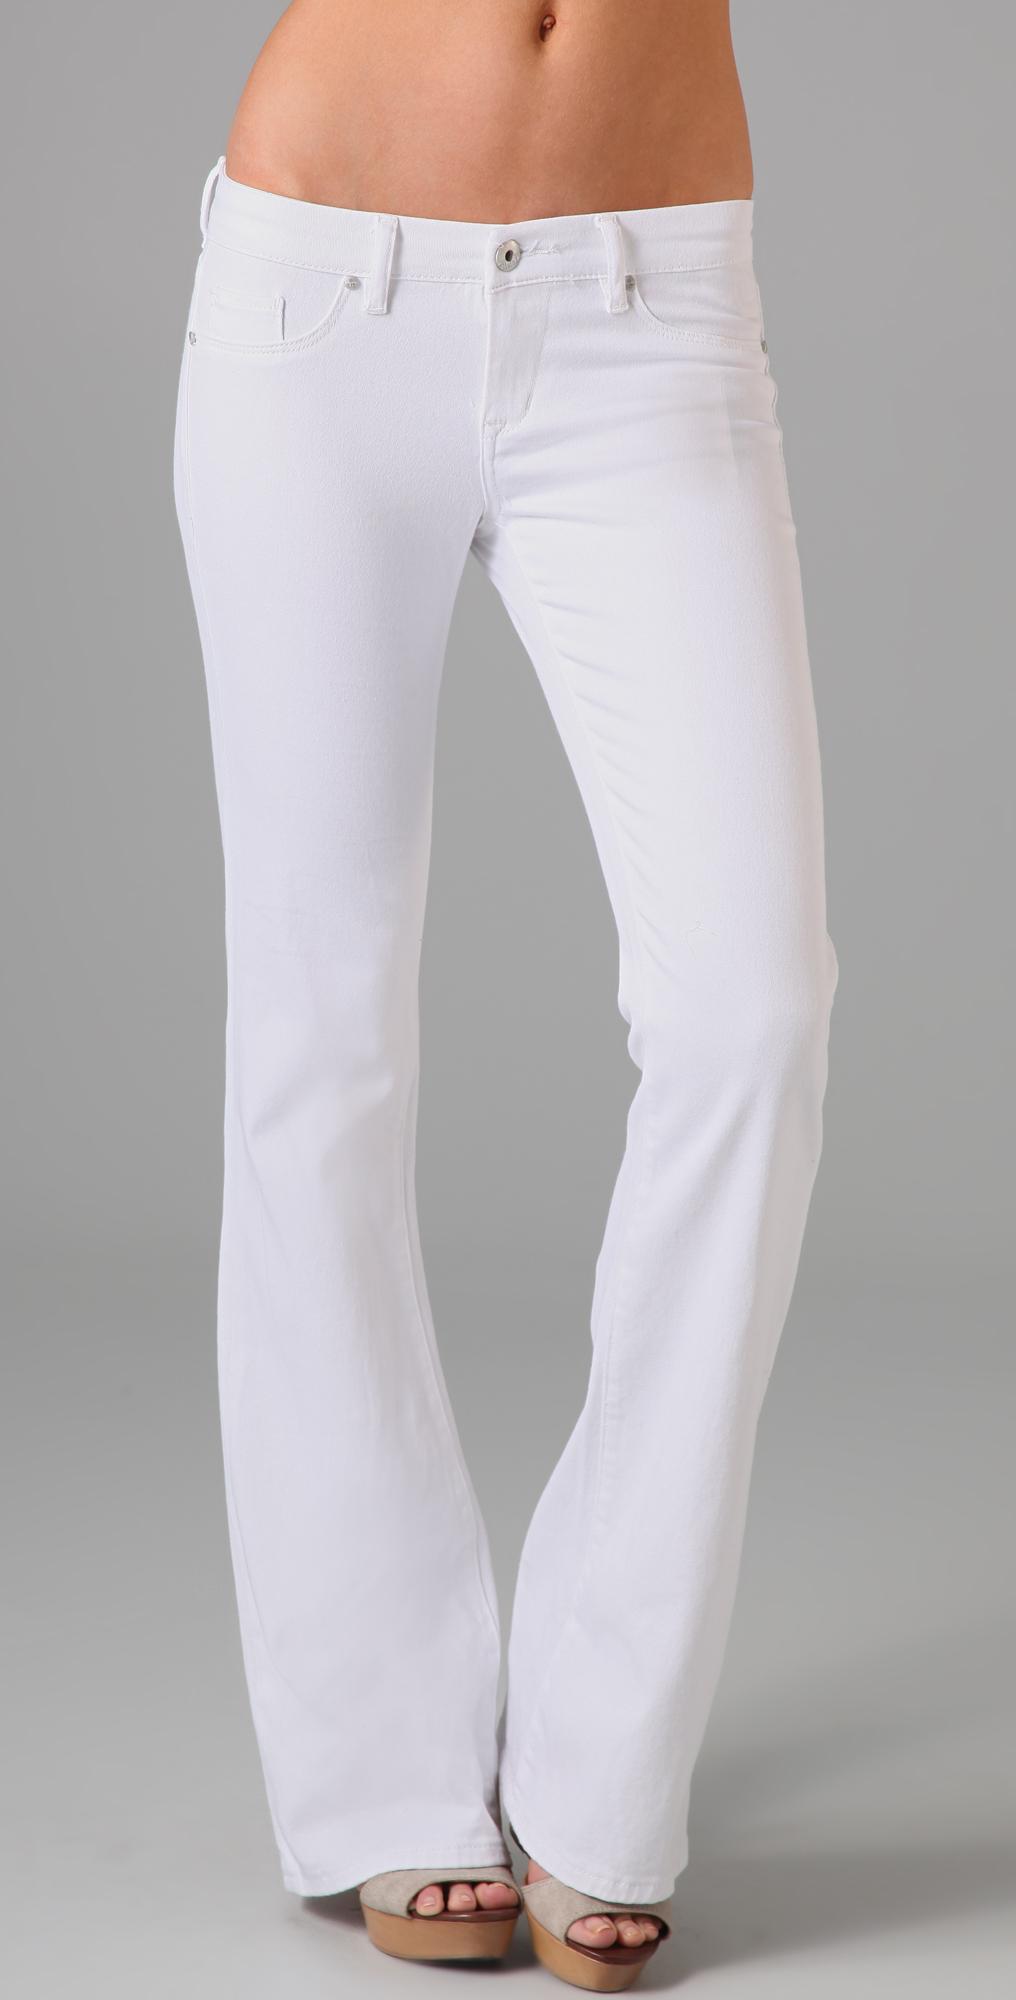 Blank Denim White Bell Bottom Jeans | 15% off first app purchase ...